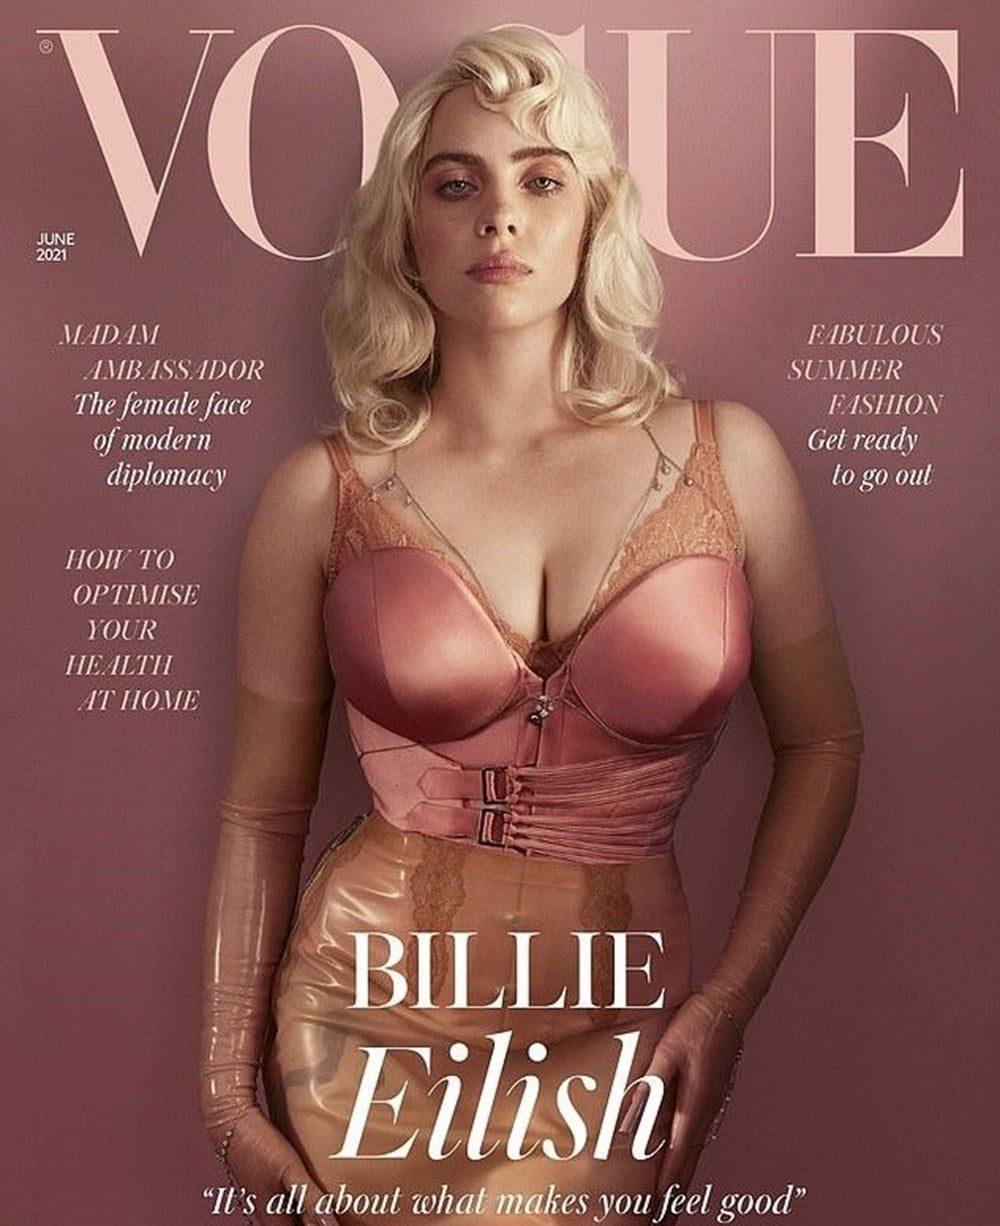 Billie Eilish very special poses for Vogue magazine 2